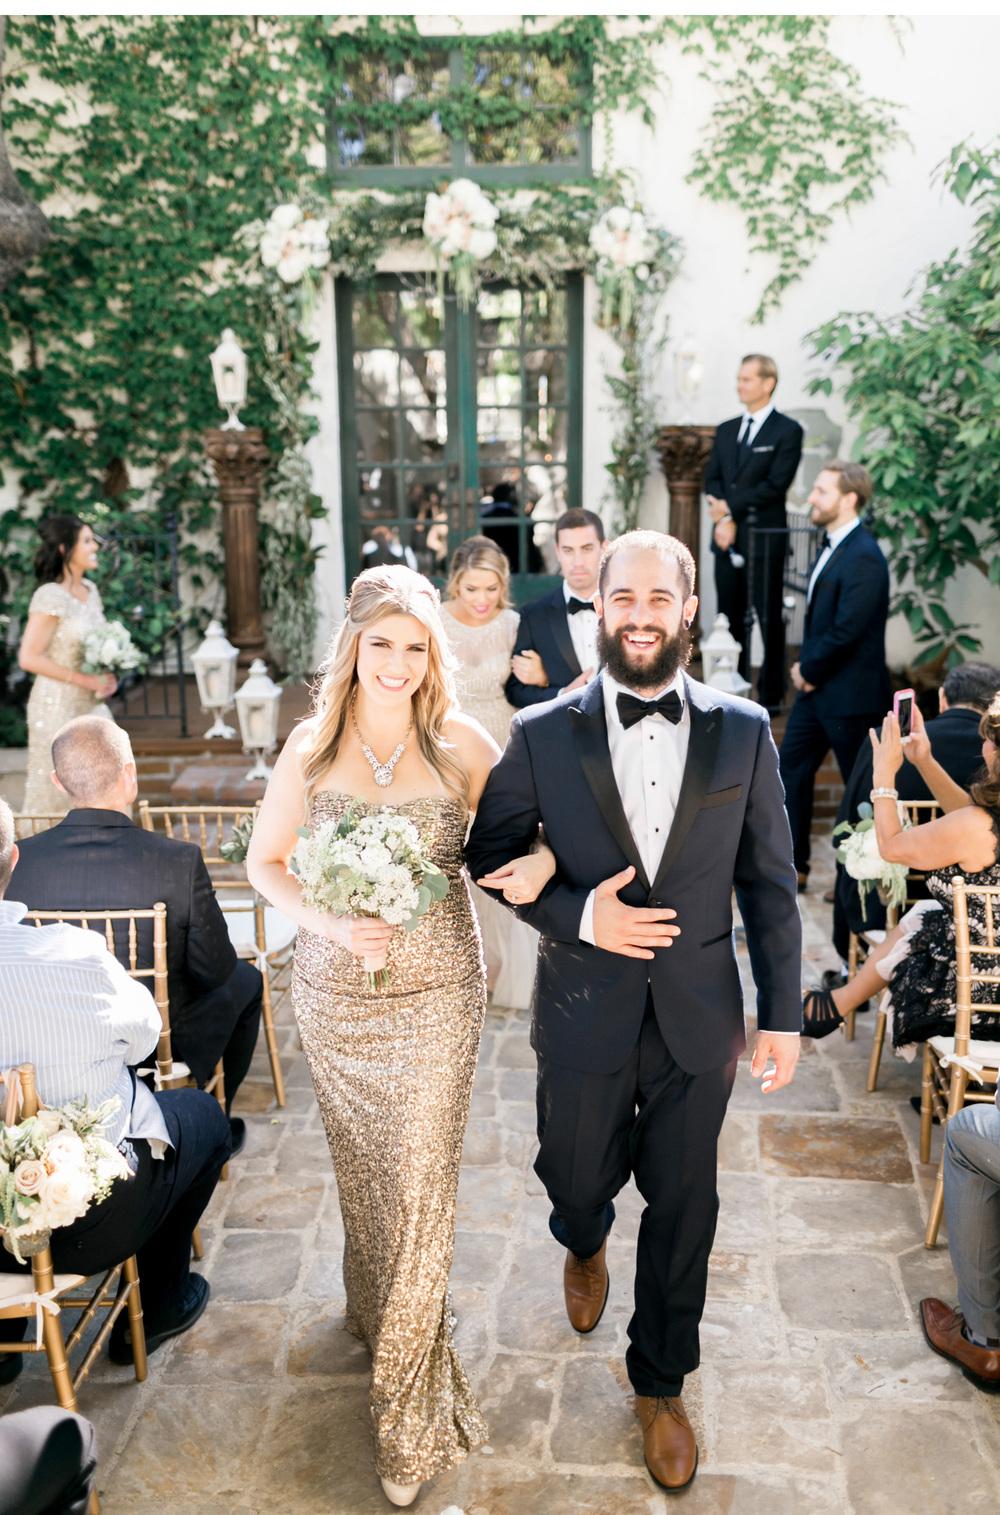 Style-Me-Pretty-Mission-San-Juan-Capistrano-Wedding-Natalie-Schutt-Photography_10.jpg